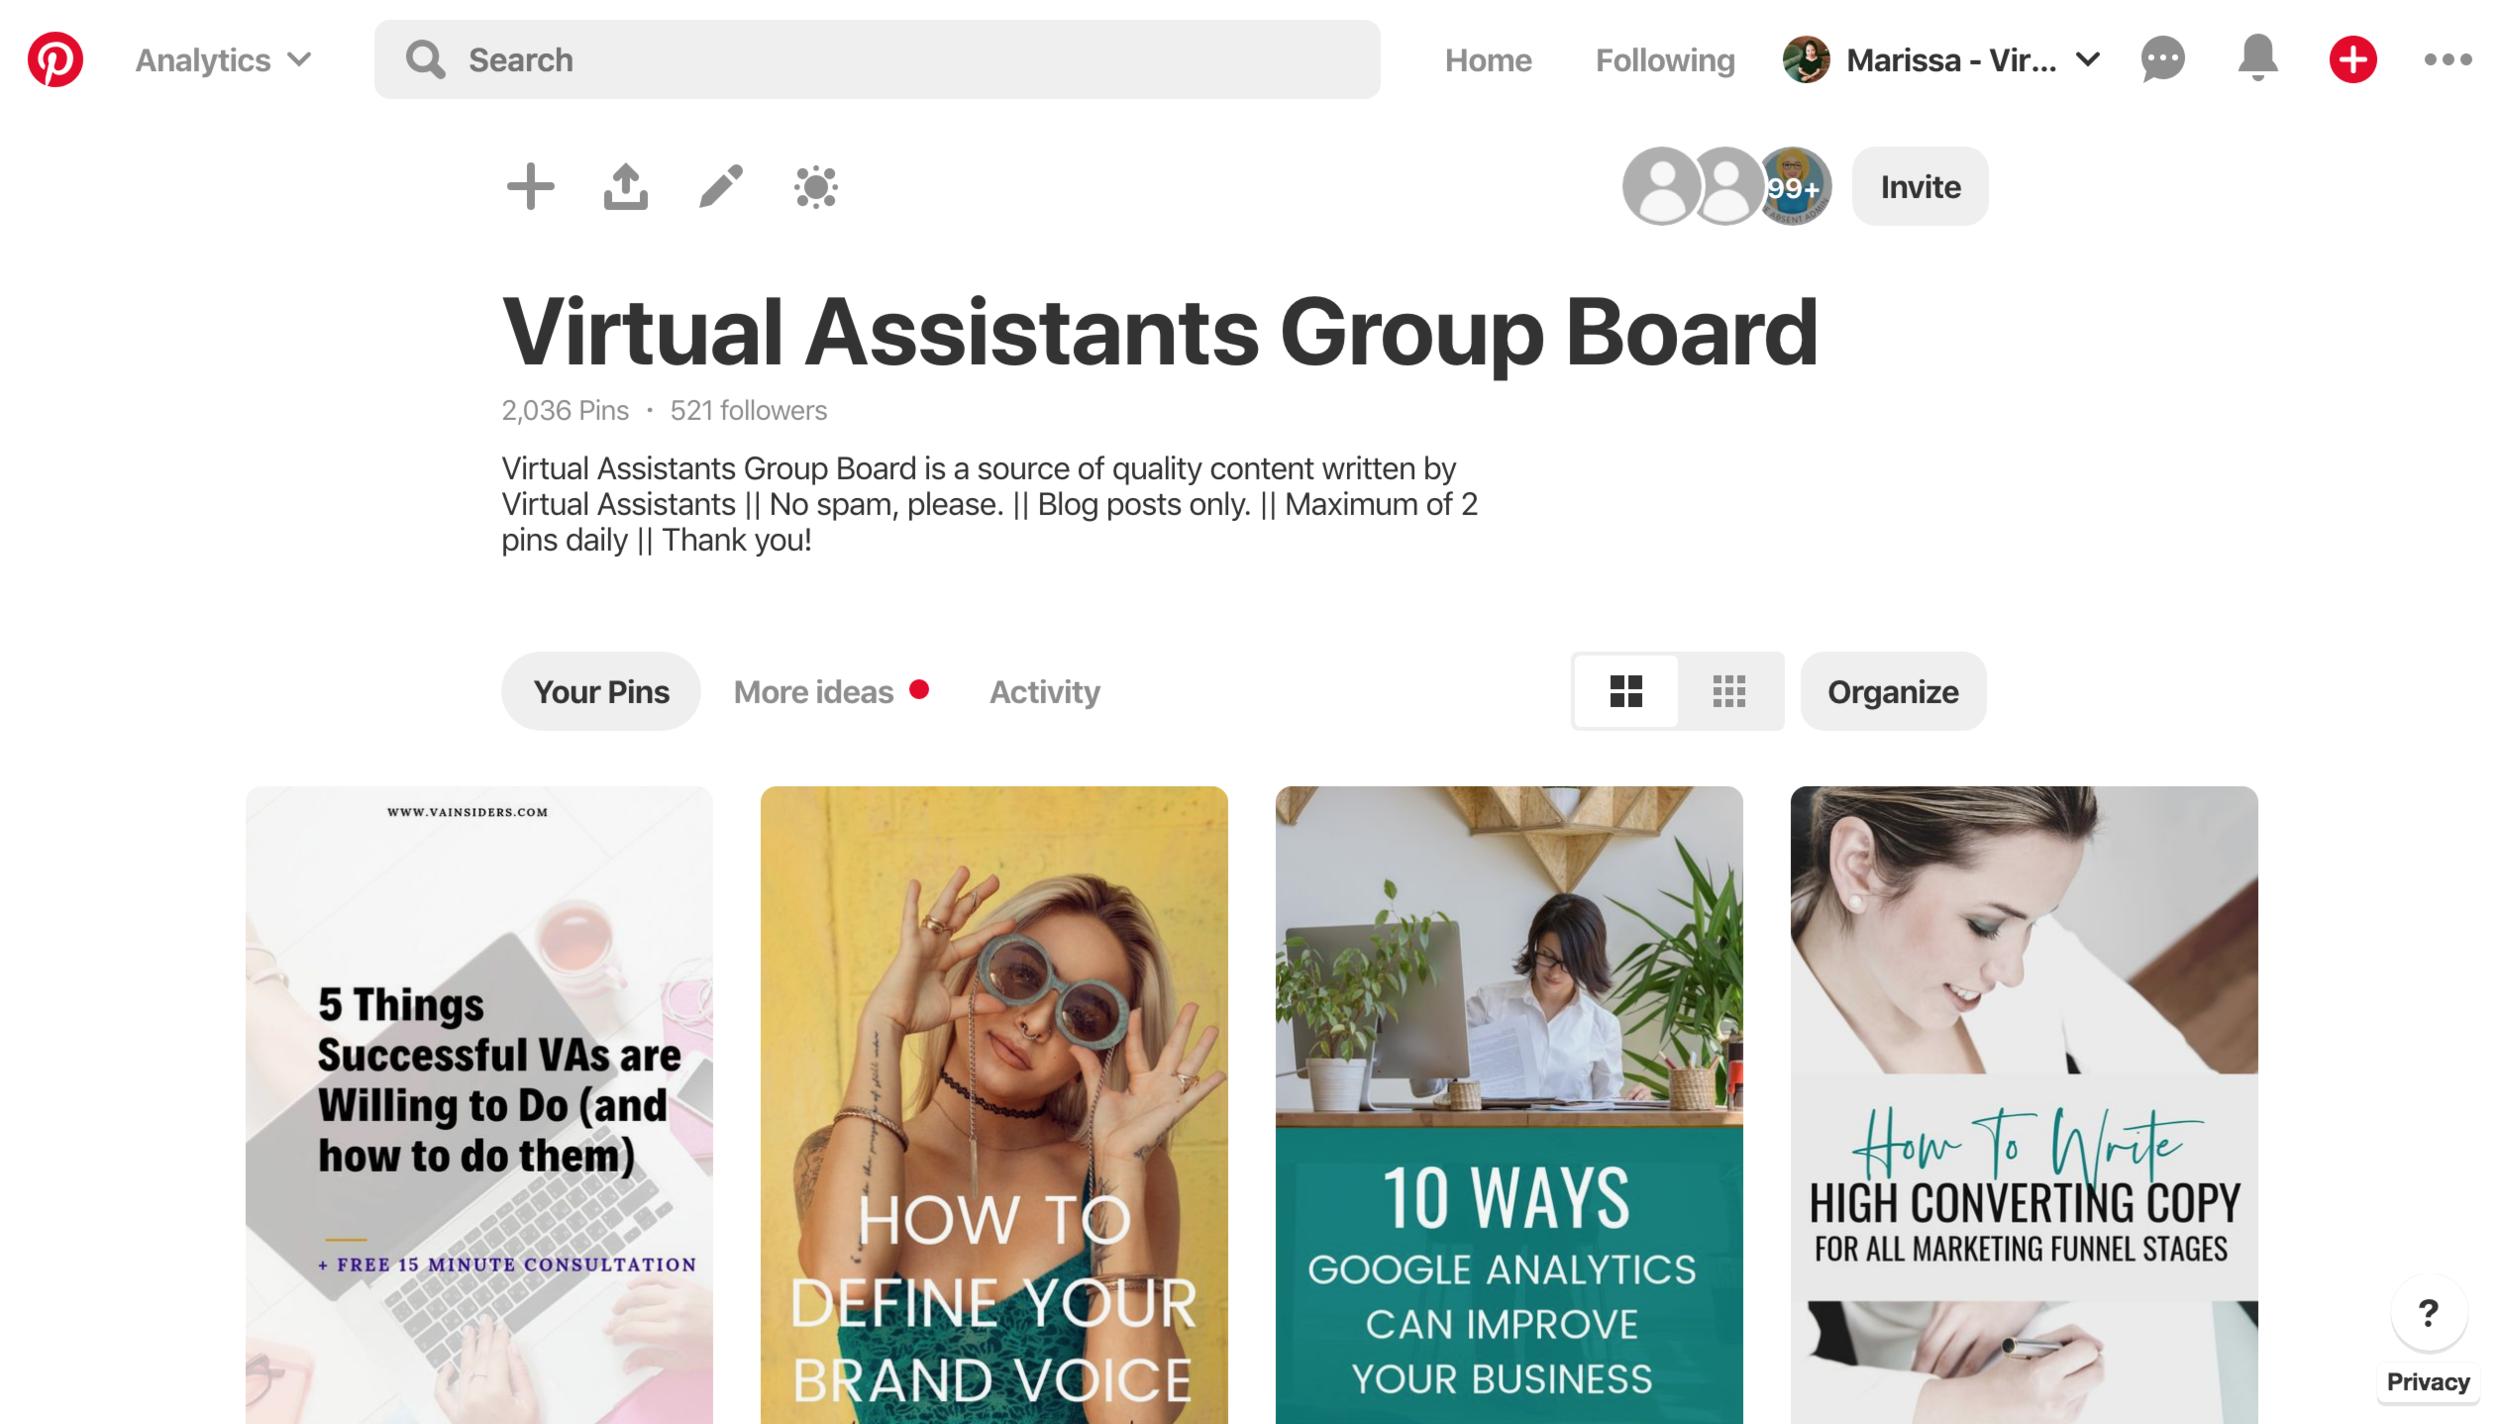 Virtual Assistants Group Board - #virtualassistant #pinterestva #pinterest #socialmedia #groupboard